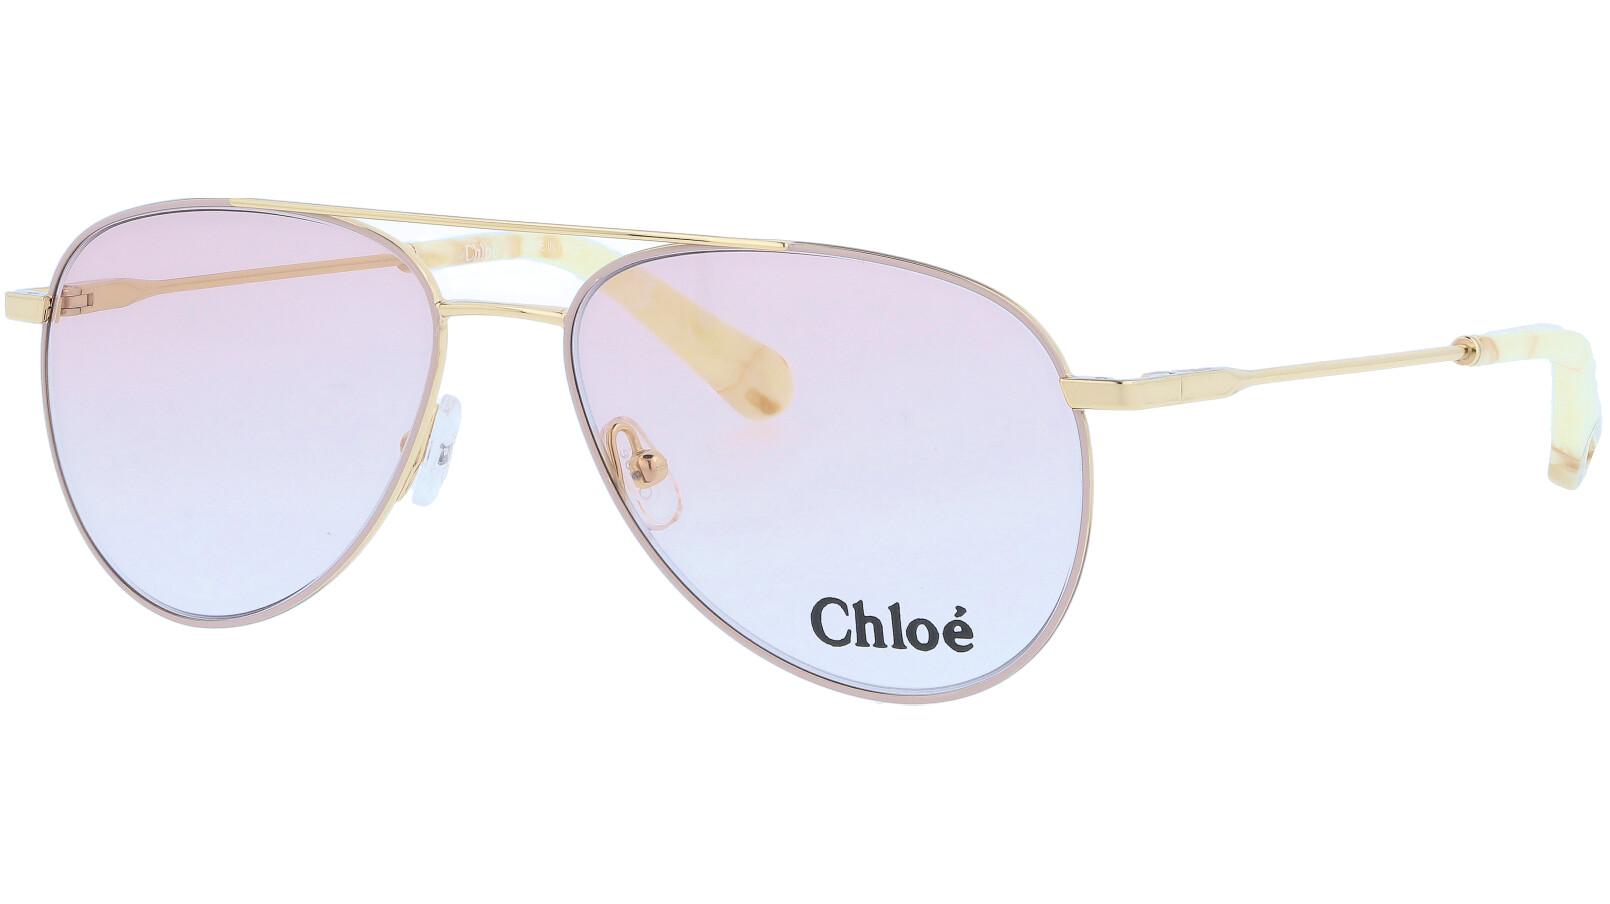 Chloé CE2137 743 55 Gold Beige Aviator Sunglasses